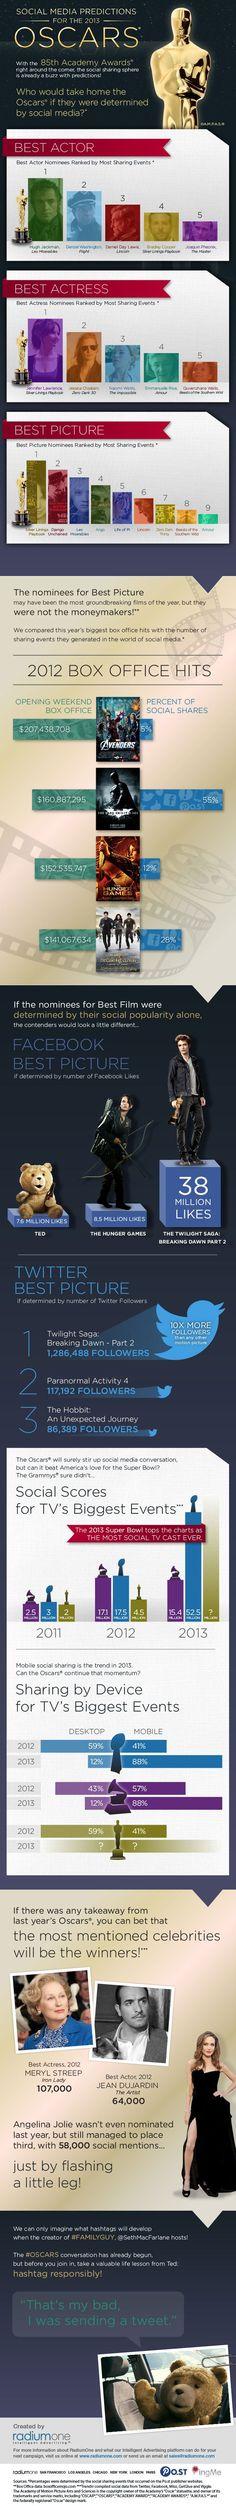 Did Social Media Users Pick Oscar Winners?